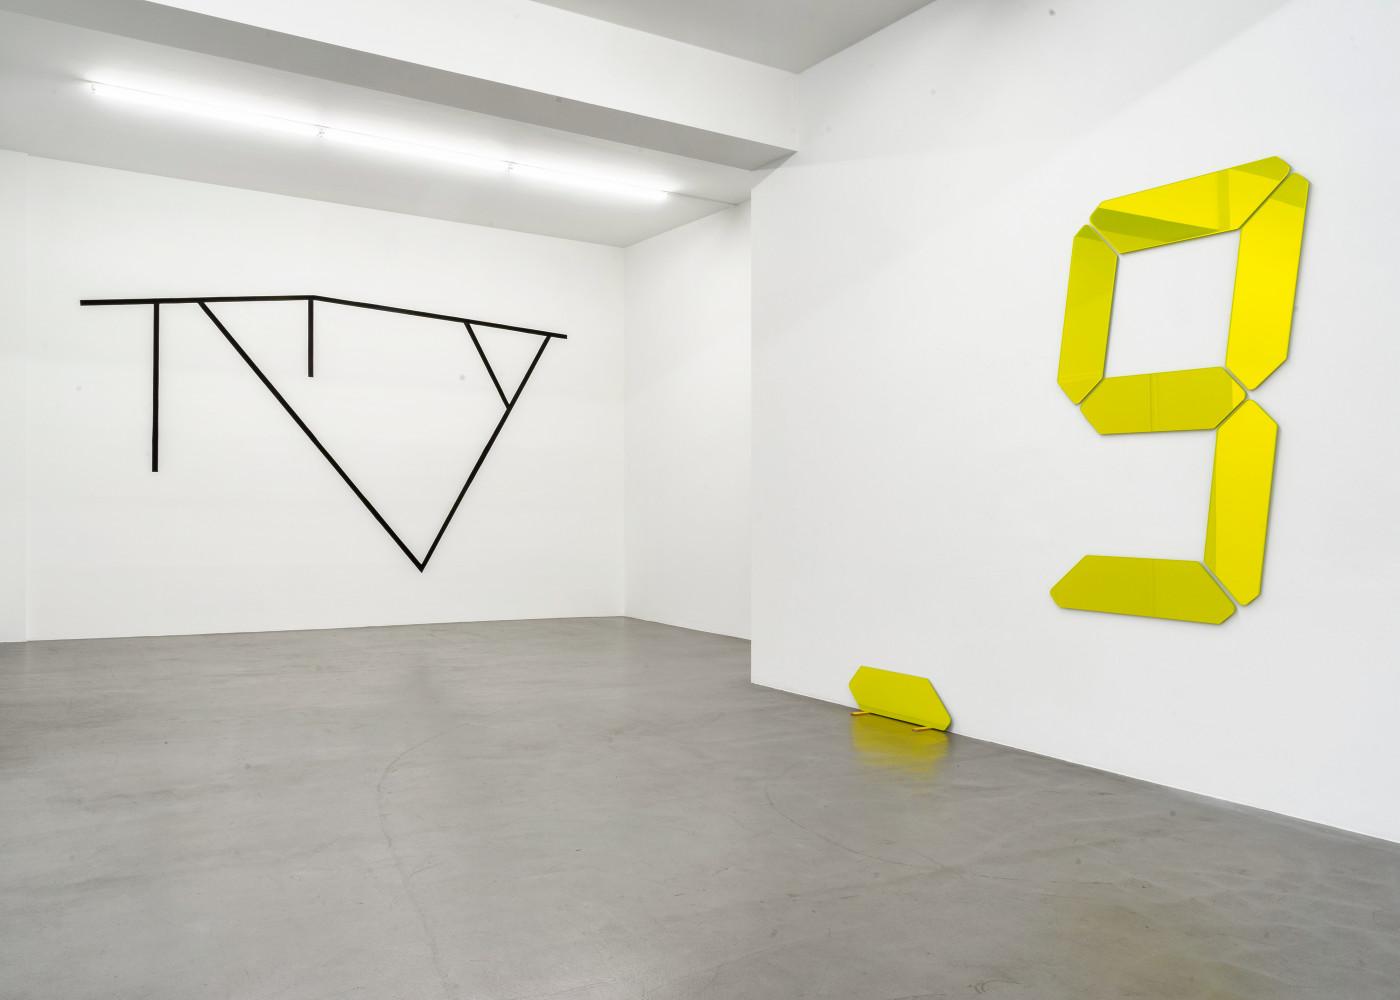 Tatsuo Miyajima, William Tucker, 'CUTOFF – Tony Cragg, Tatsuo Miyajima, Bettina Pousttchi, William Tucker', Installation view, Buchmann Galerie, 2020